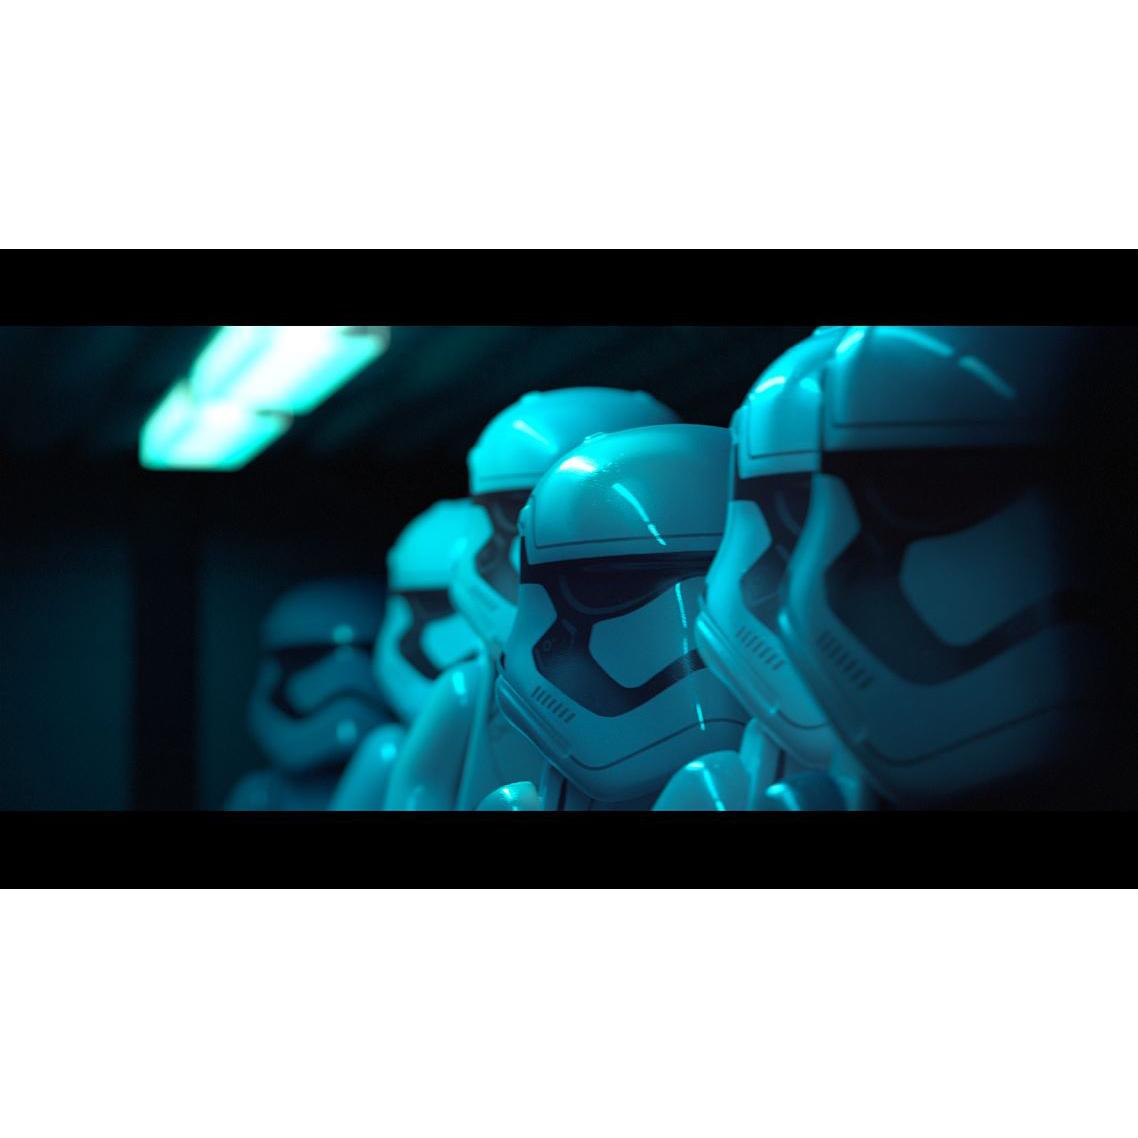 Joc LEGO : STAR WARS THE FORCE AWAKENS pentru PC 6